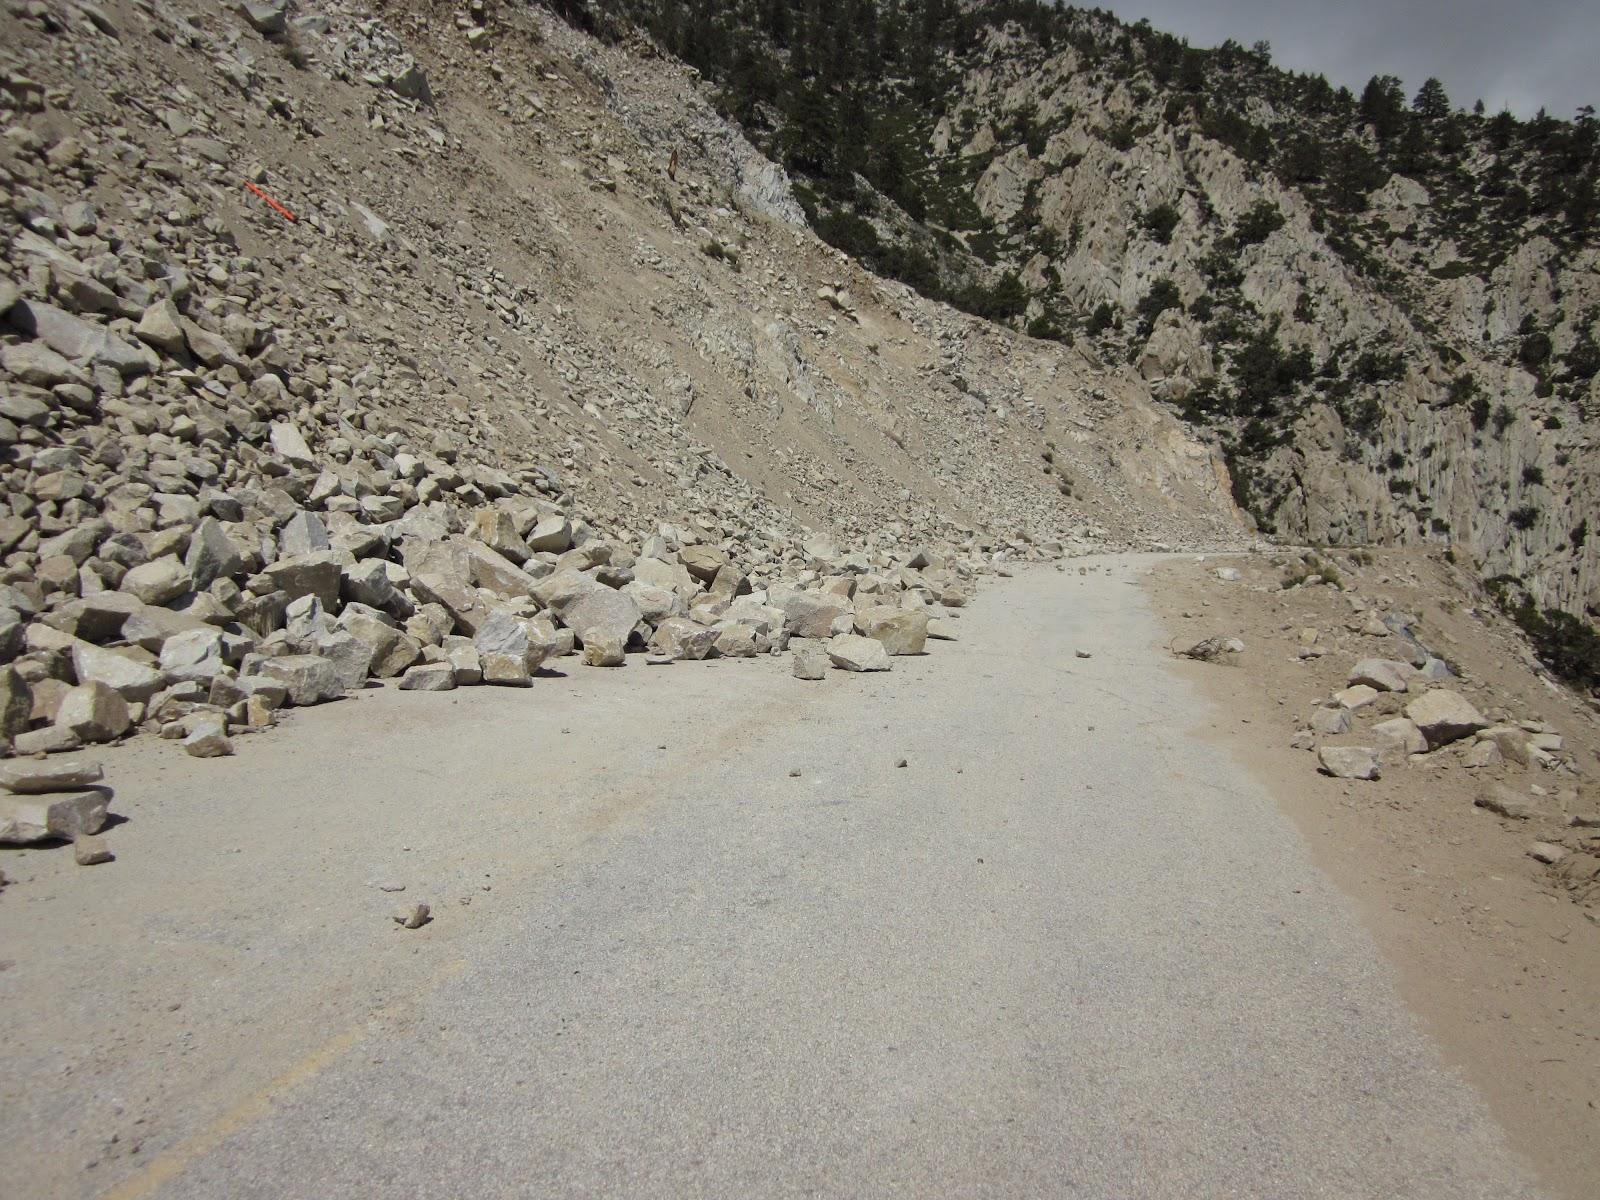 Landslide and rocks on Horseshoe Meadows road during bike climb.